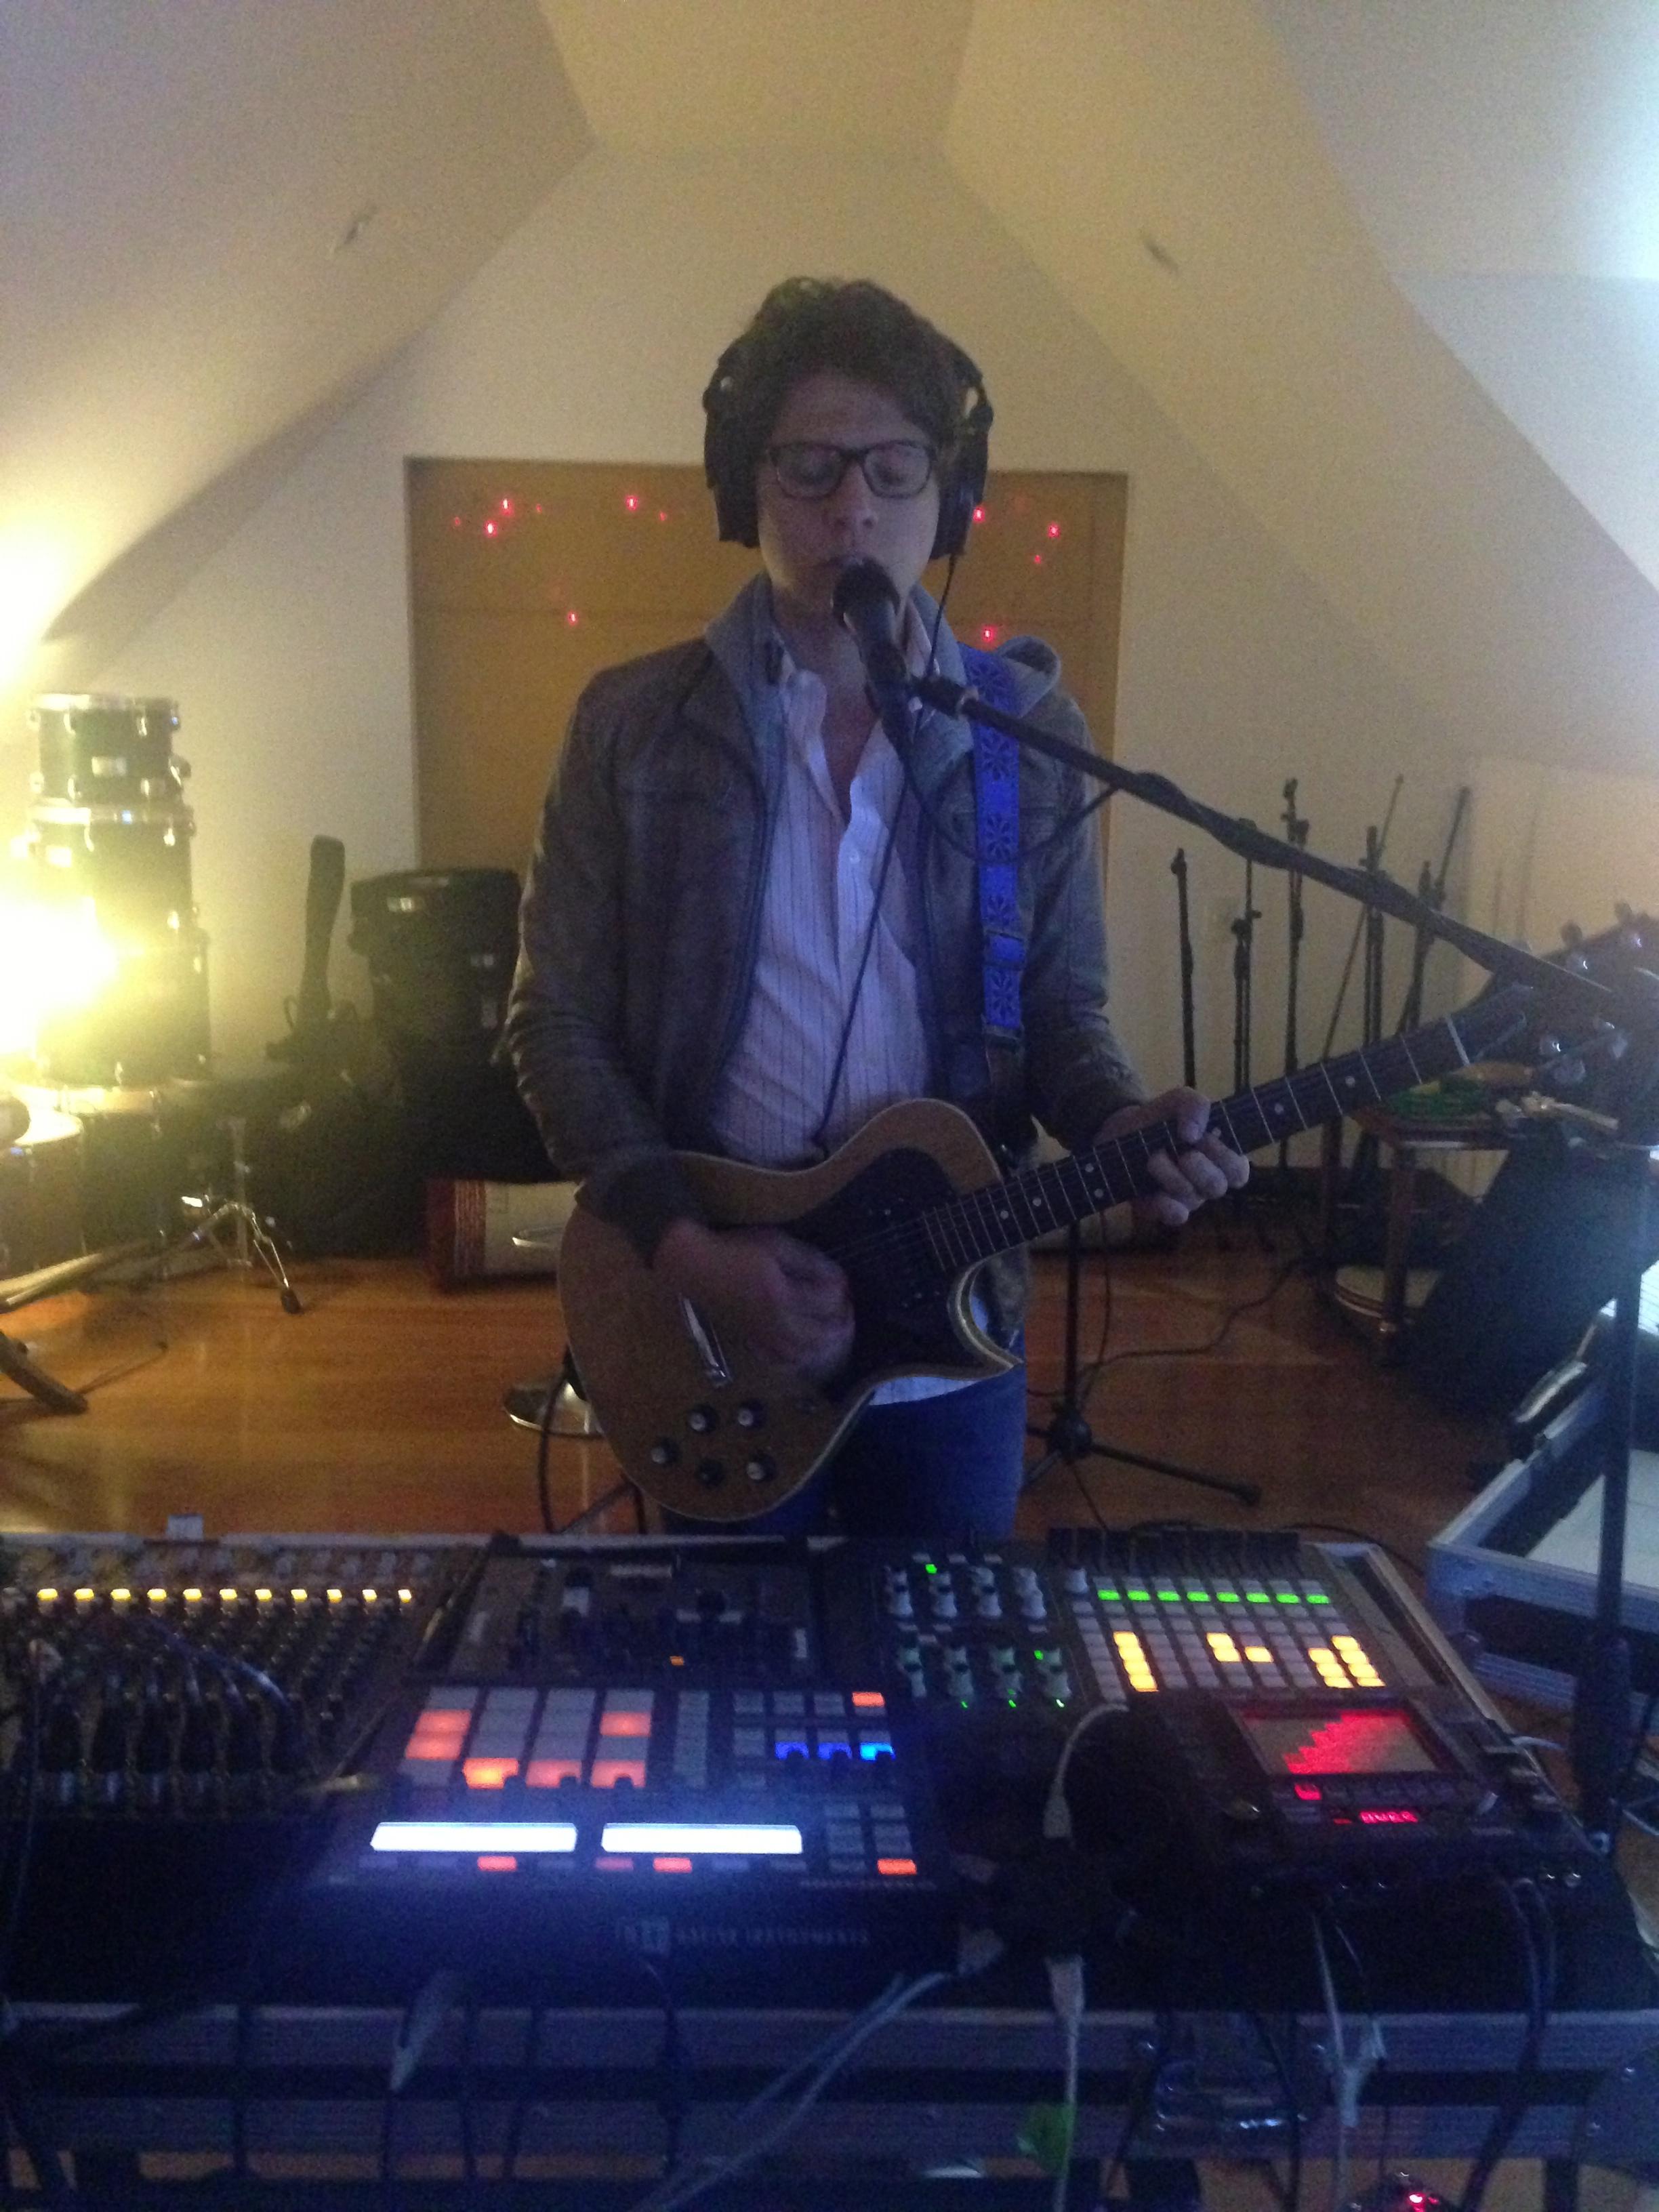 Rehearsing vocals